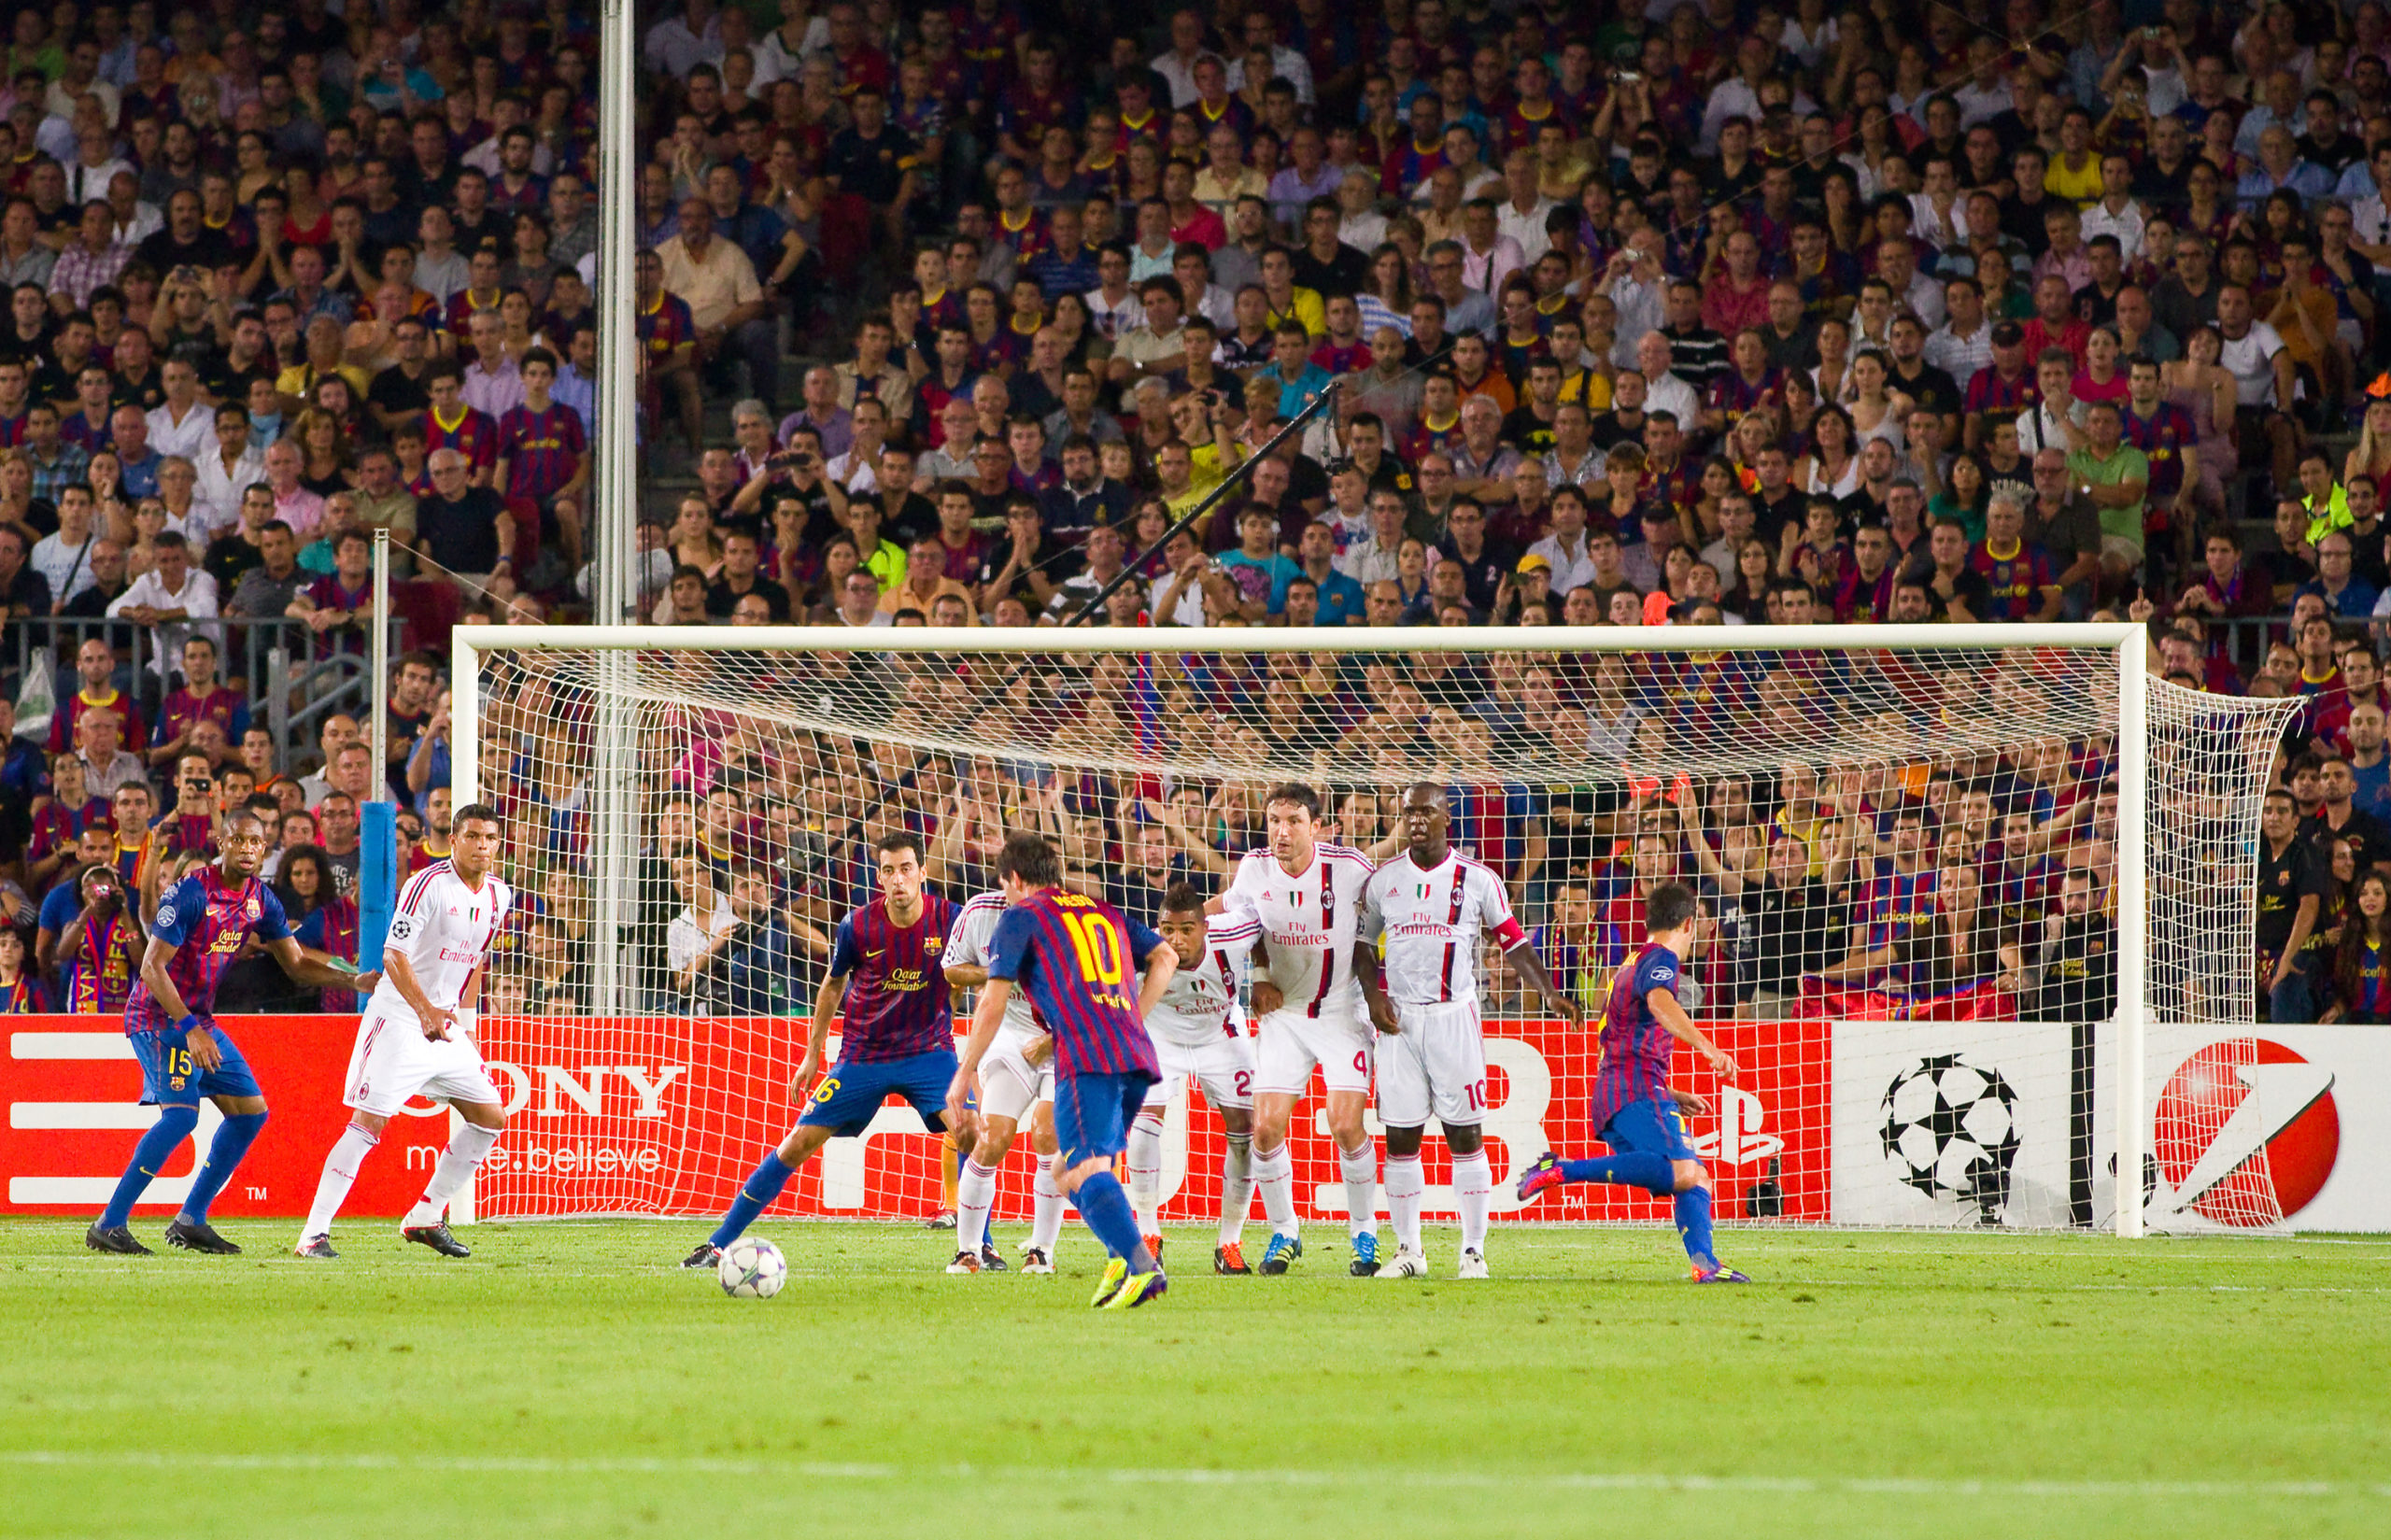 Best soccer free kick taker Lionel Messi shooting a soccer free kick